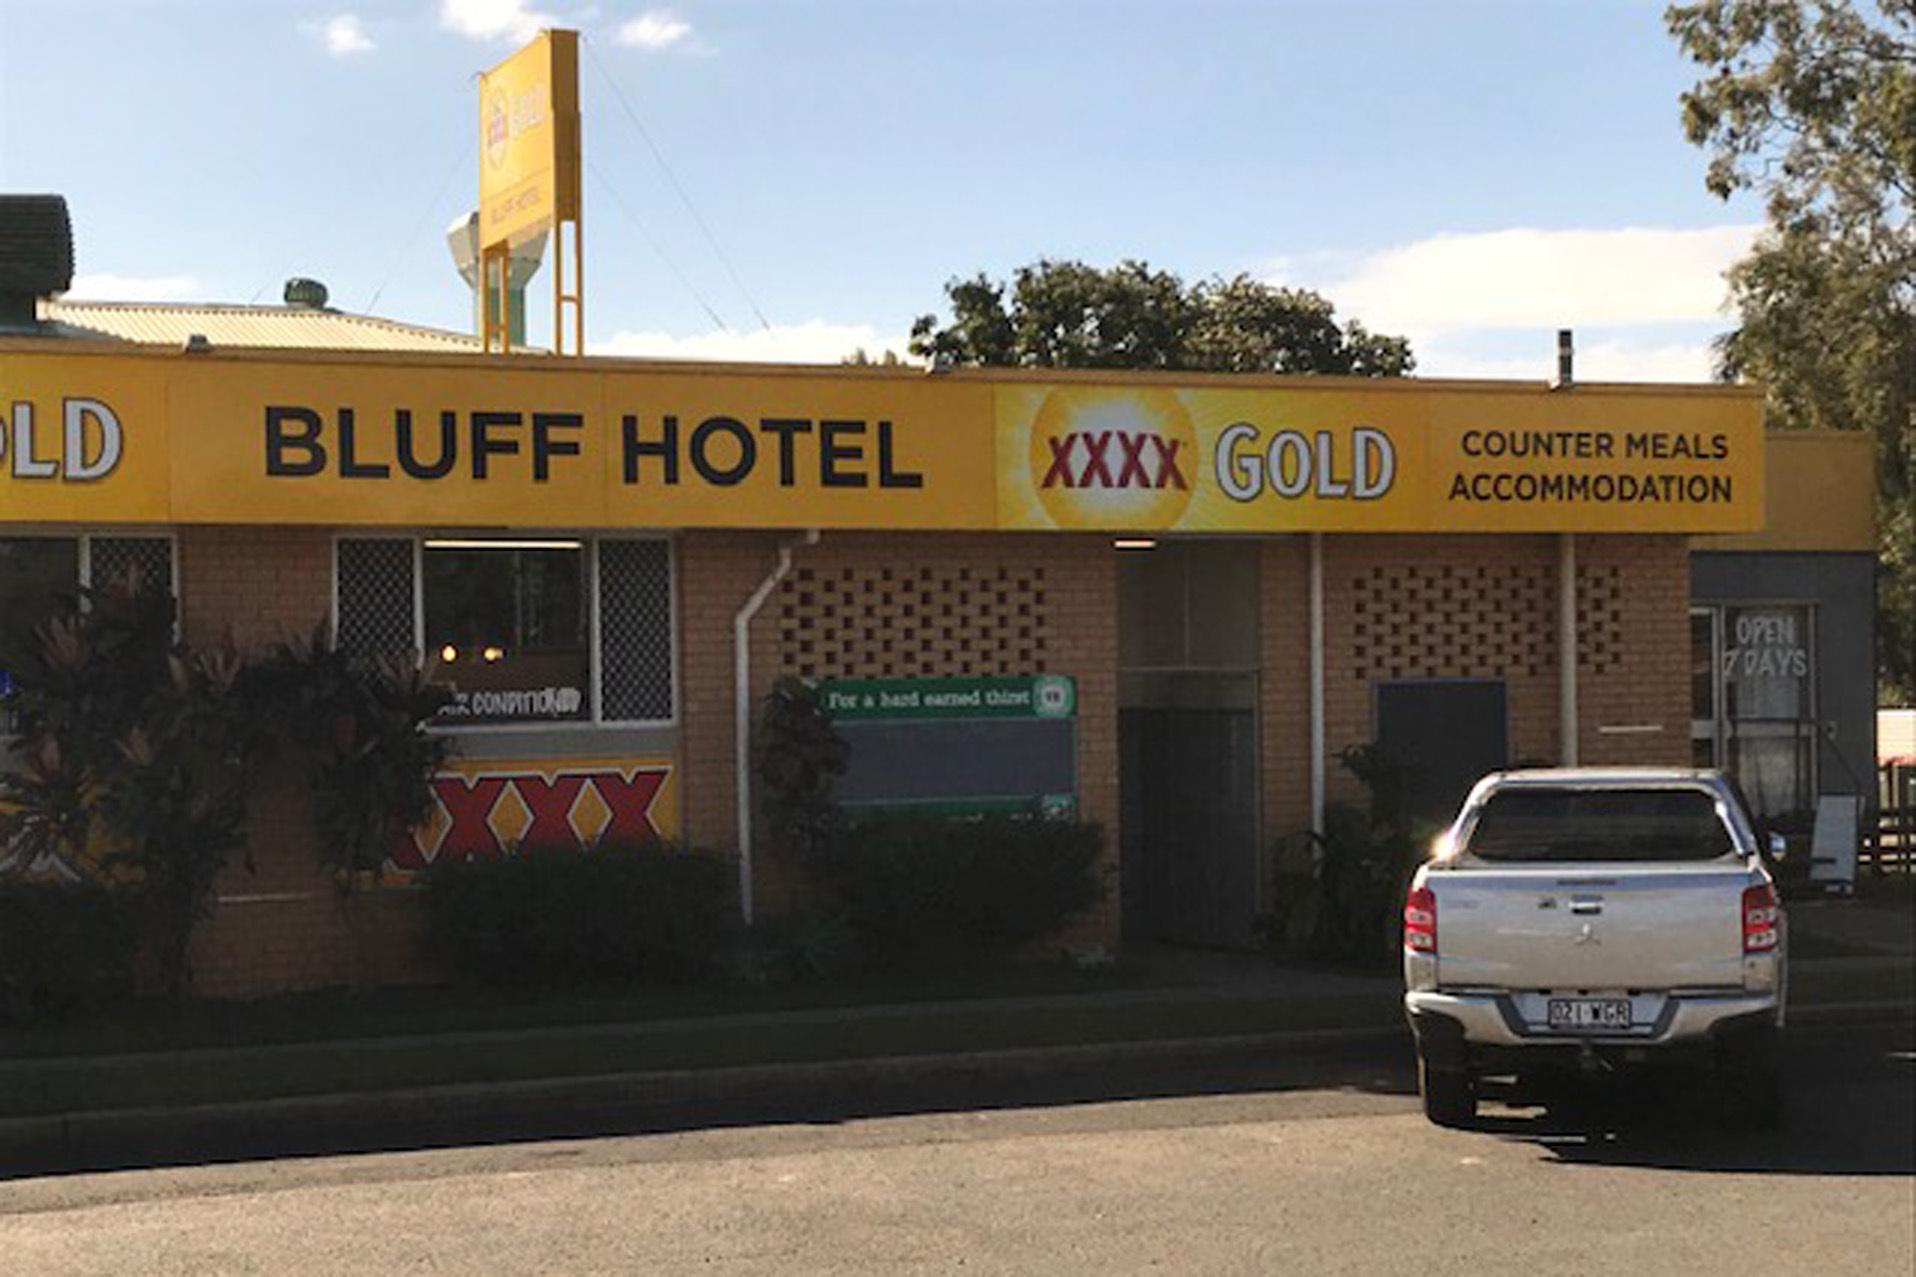 Bluff Hotel